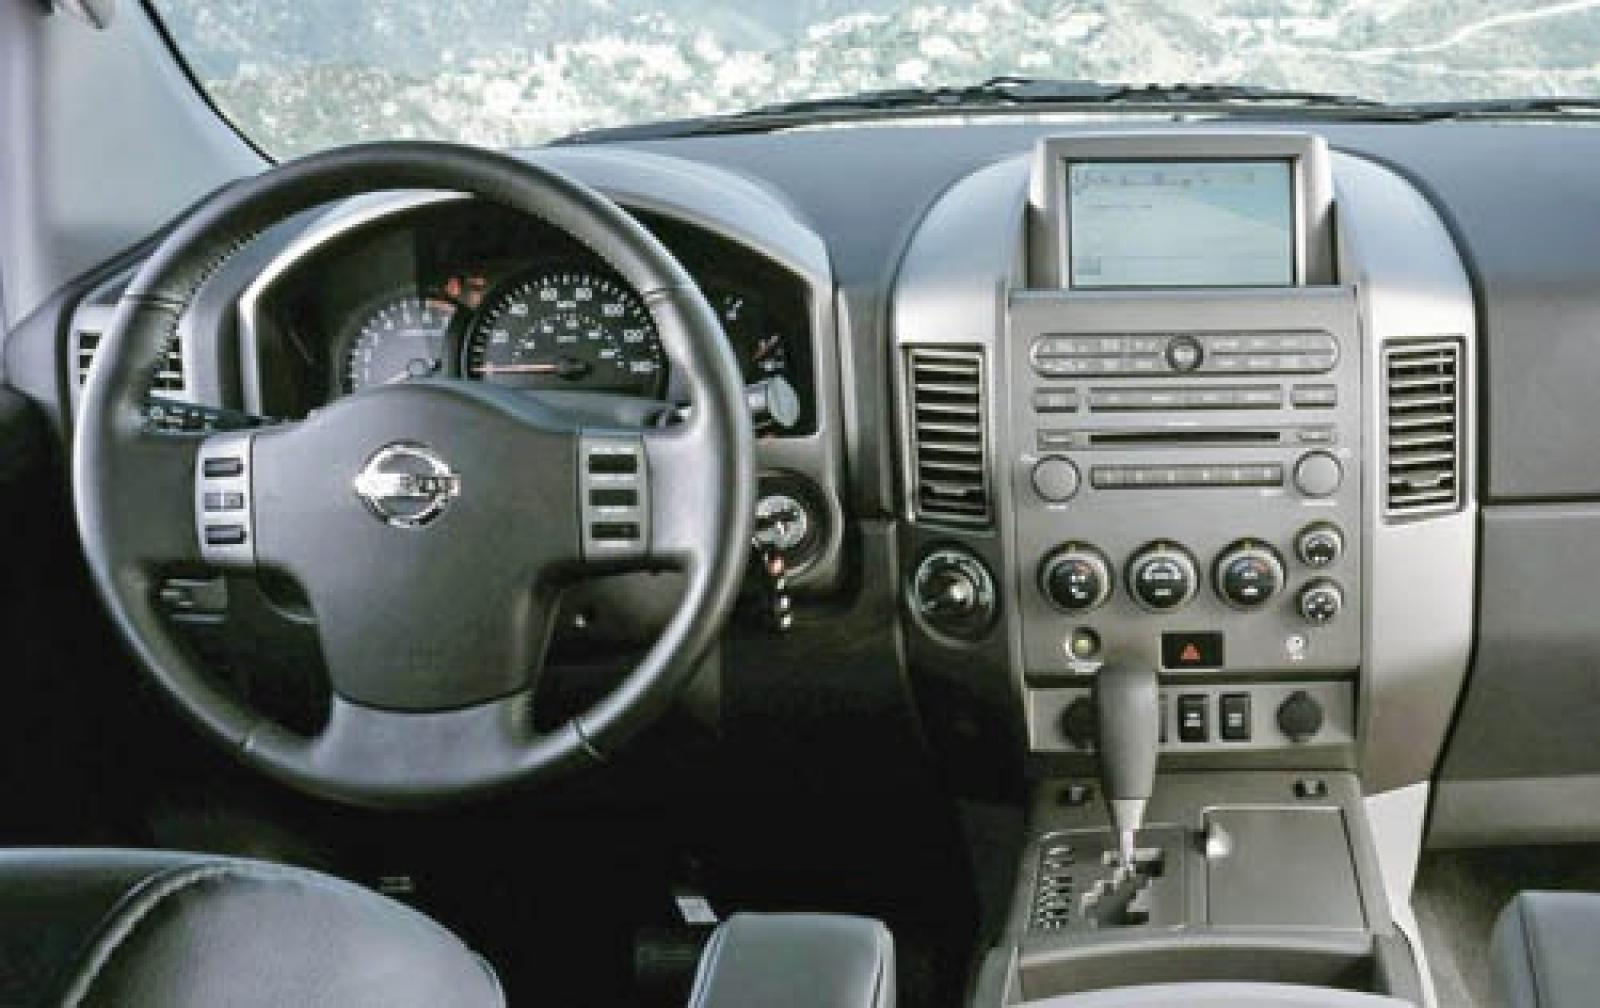 800 1024 1280 1600 Origin 2006 Nissan Armada